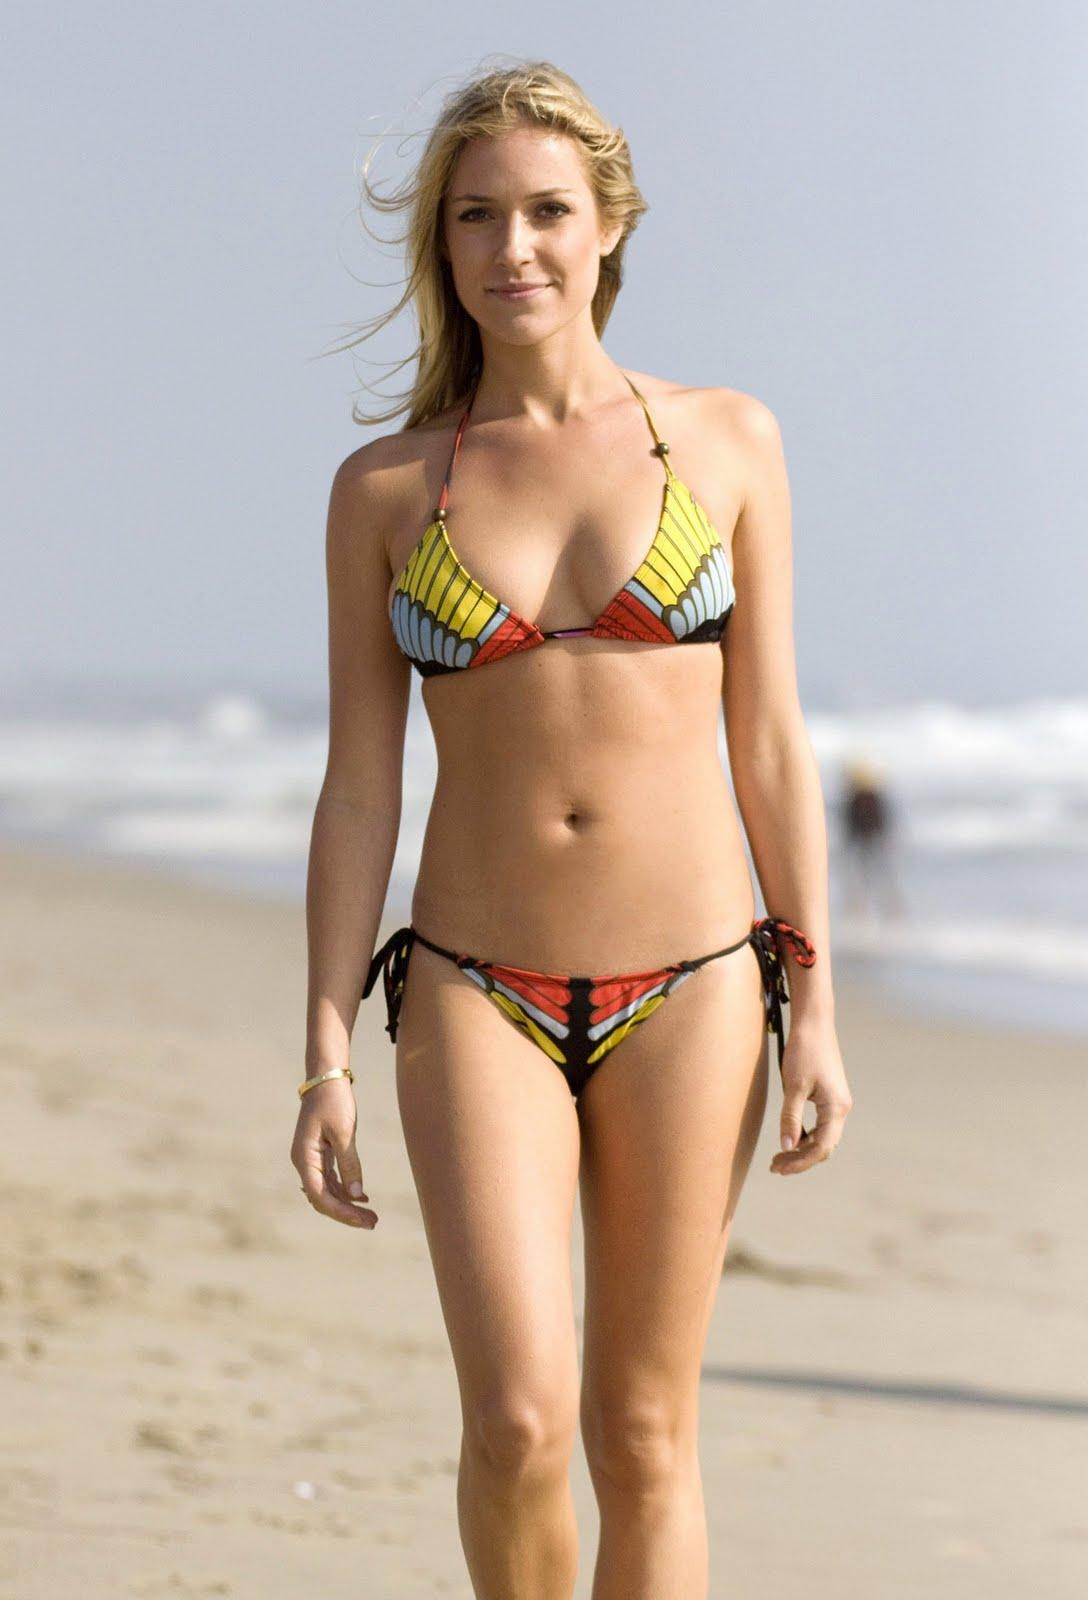 stewart bikini Kristen